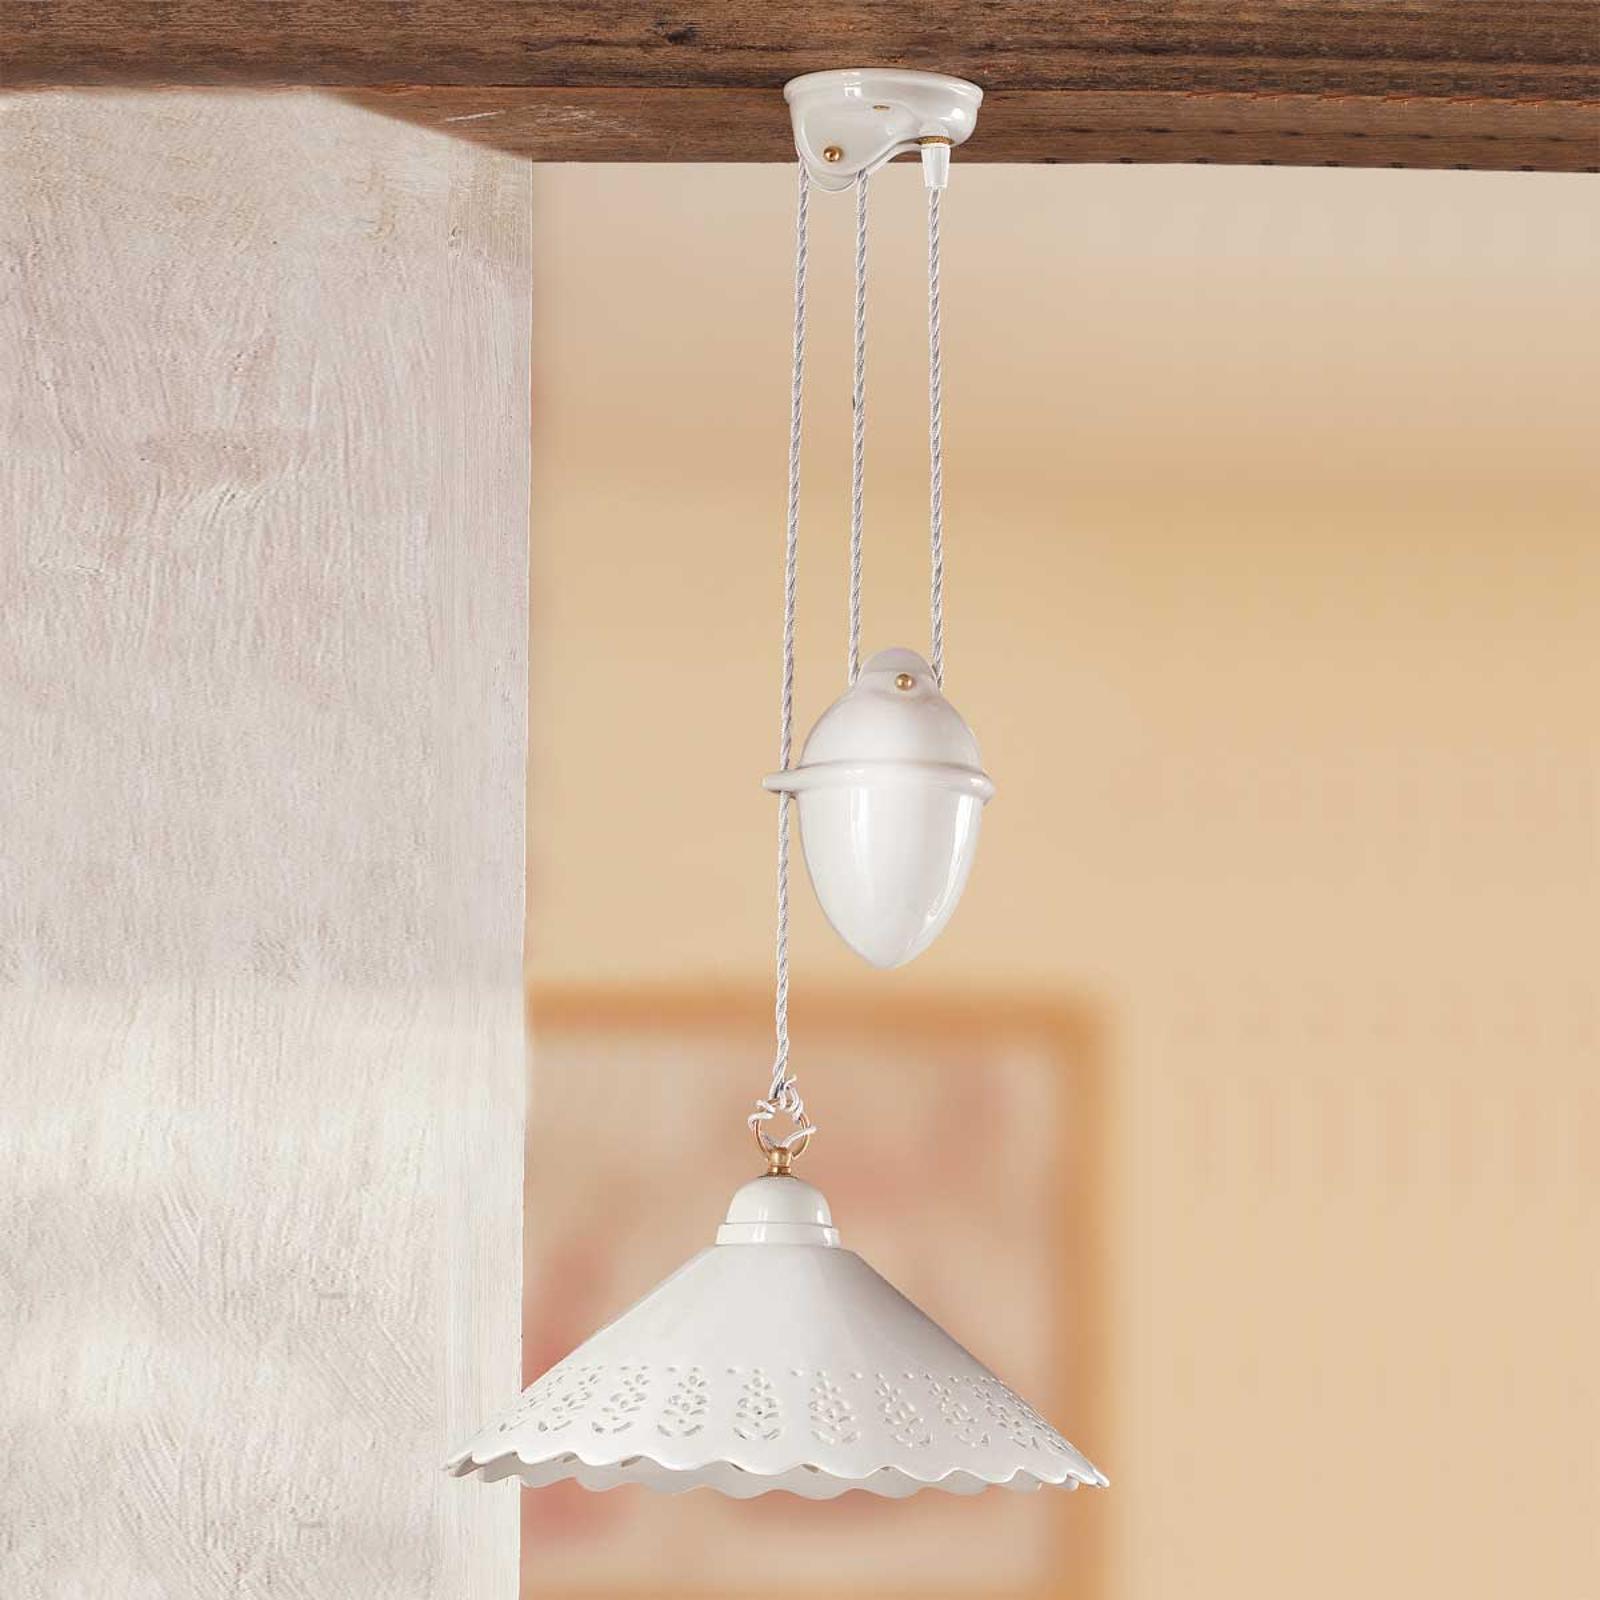 Pizzo hængelampe med wire, 1 lyskilde, 40 cm